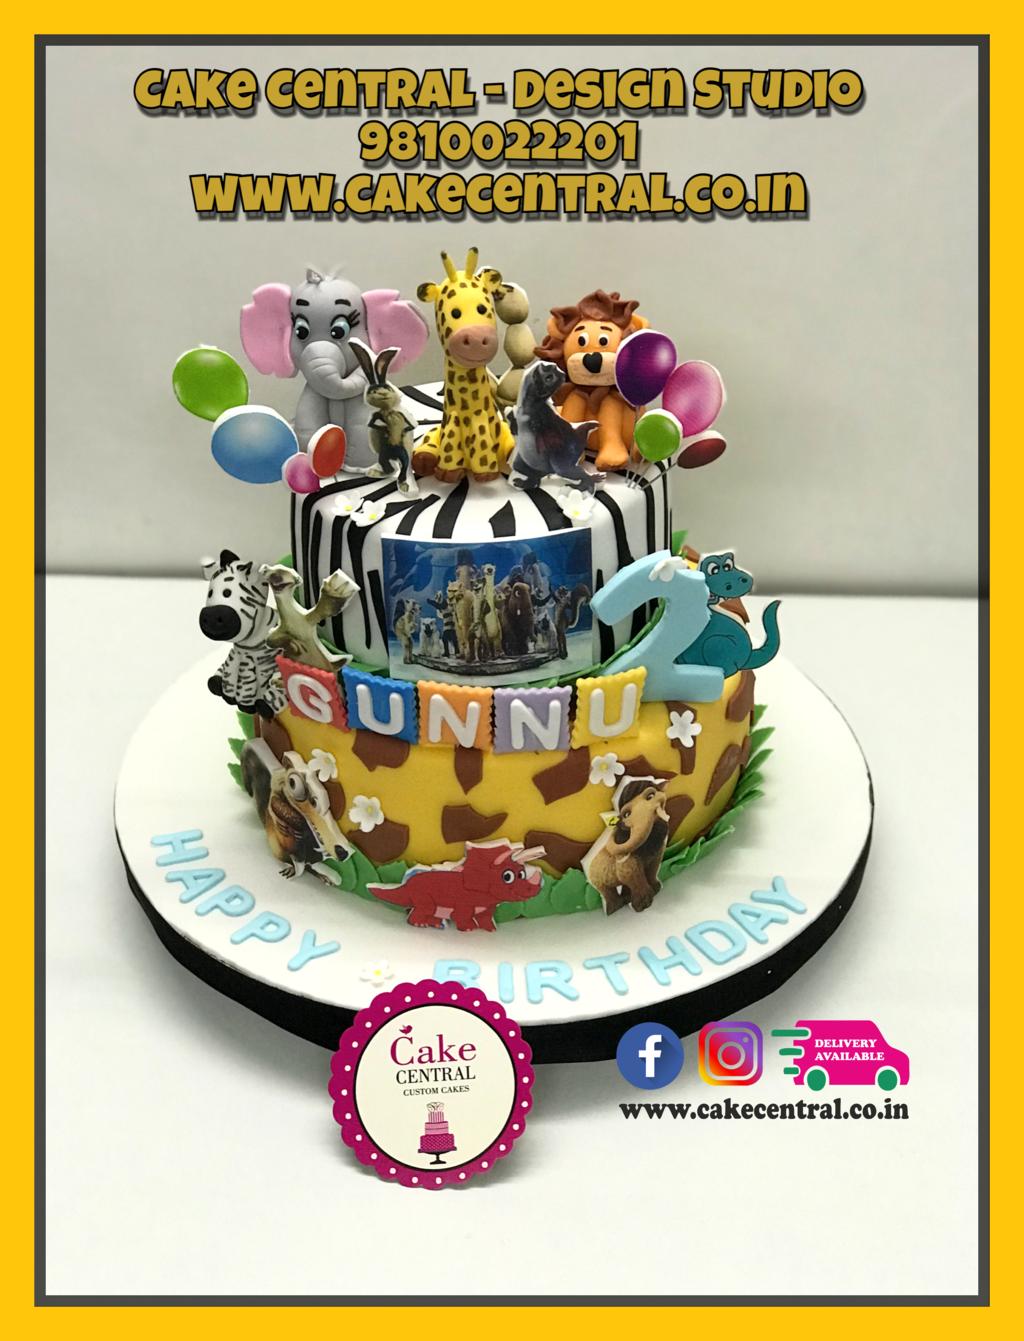 Jungle Cake By Cake Central Premier Cake Design Studio New Delhi